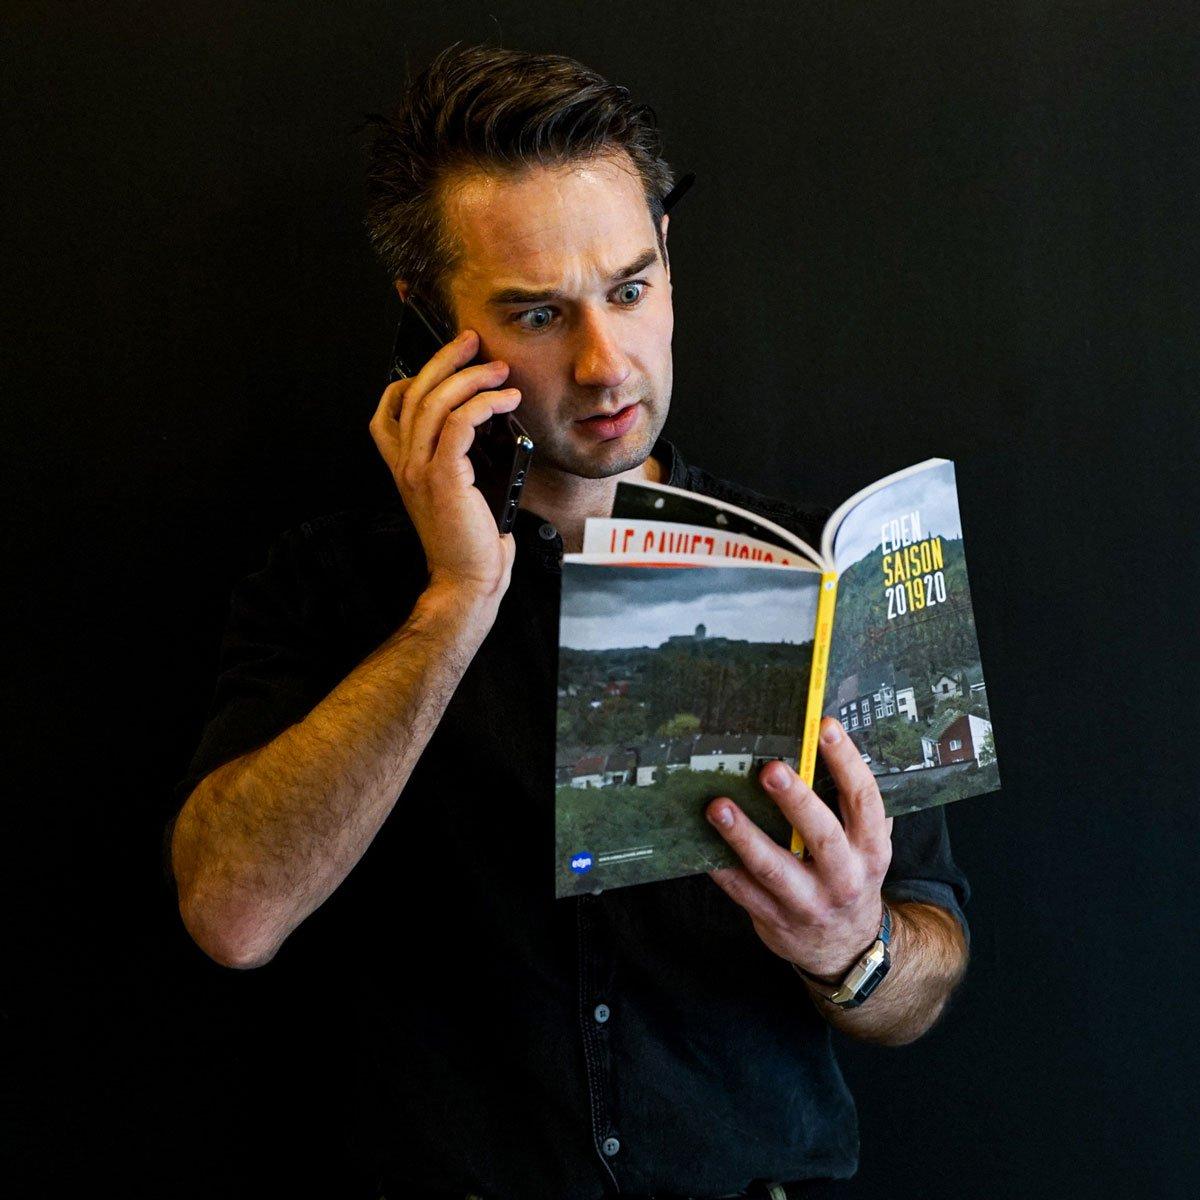 Arnaud Baugnée - Coordinateur de la communication - Eden, Centre Culturel de Charleroi